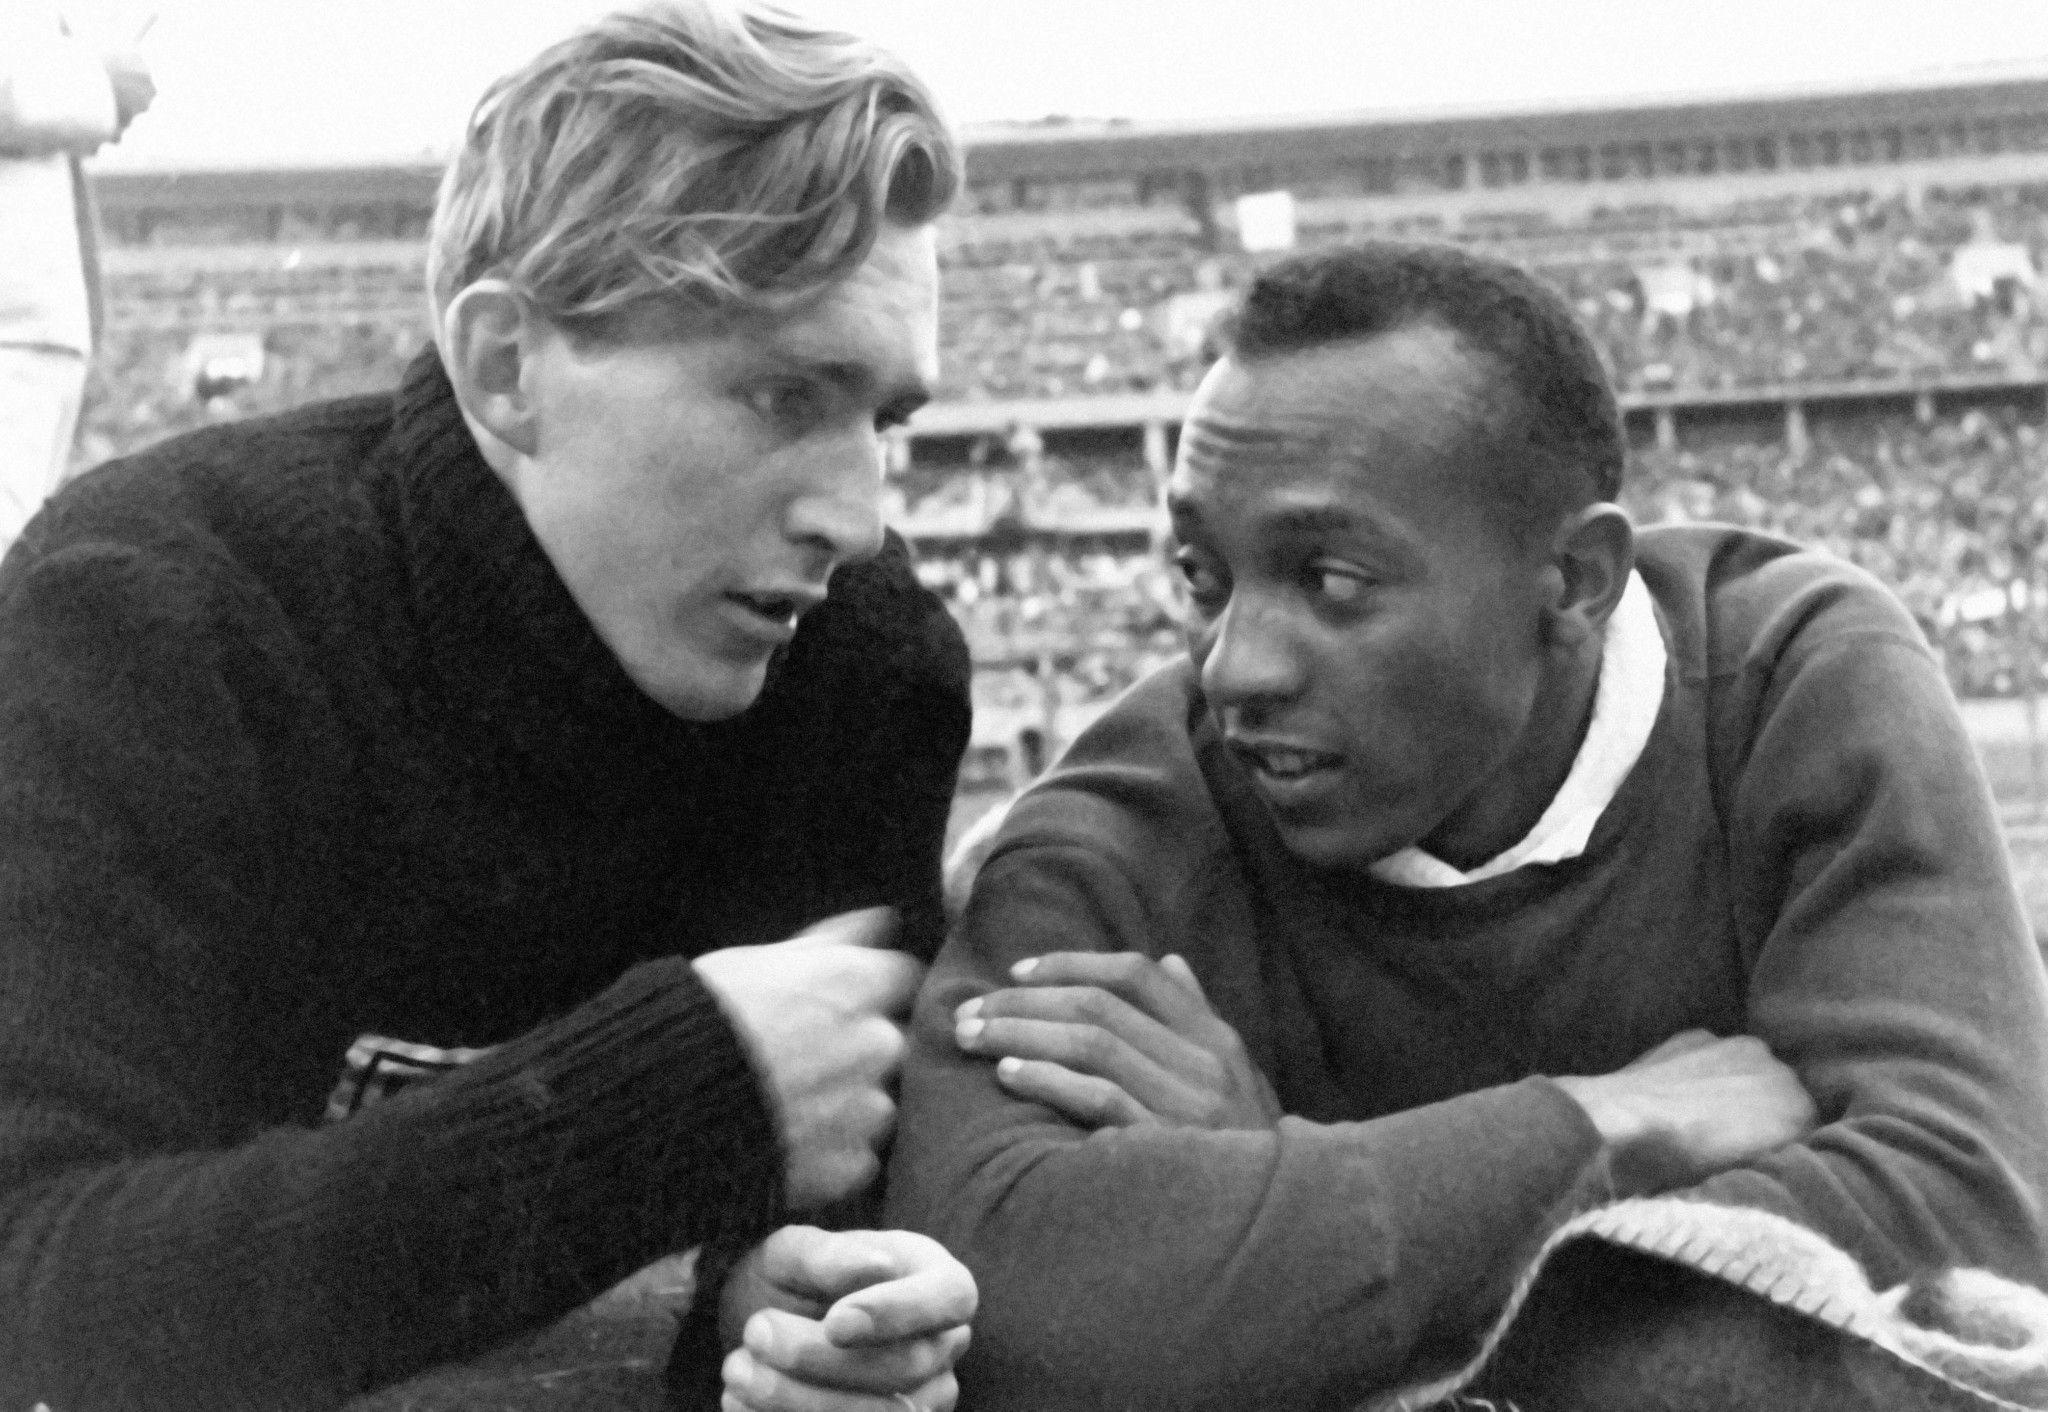 Amistad de Jesse Owens y Lutz Long